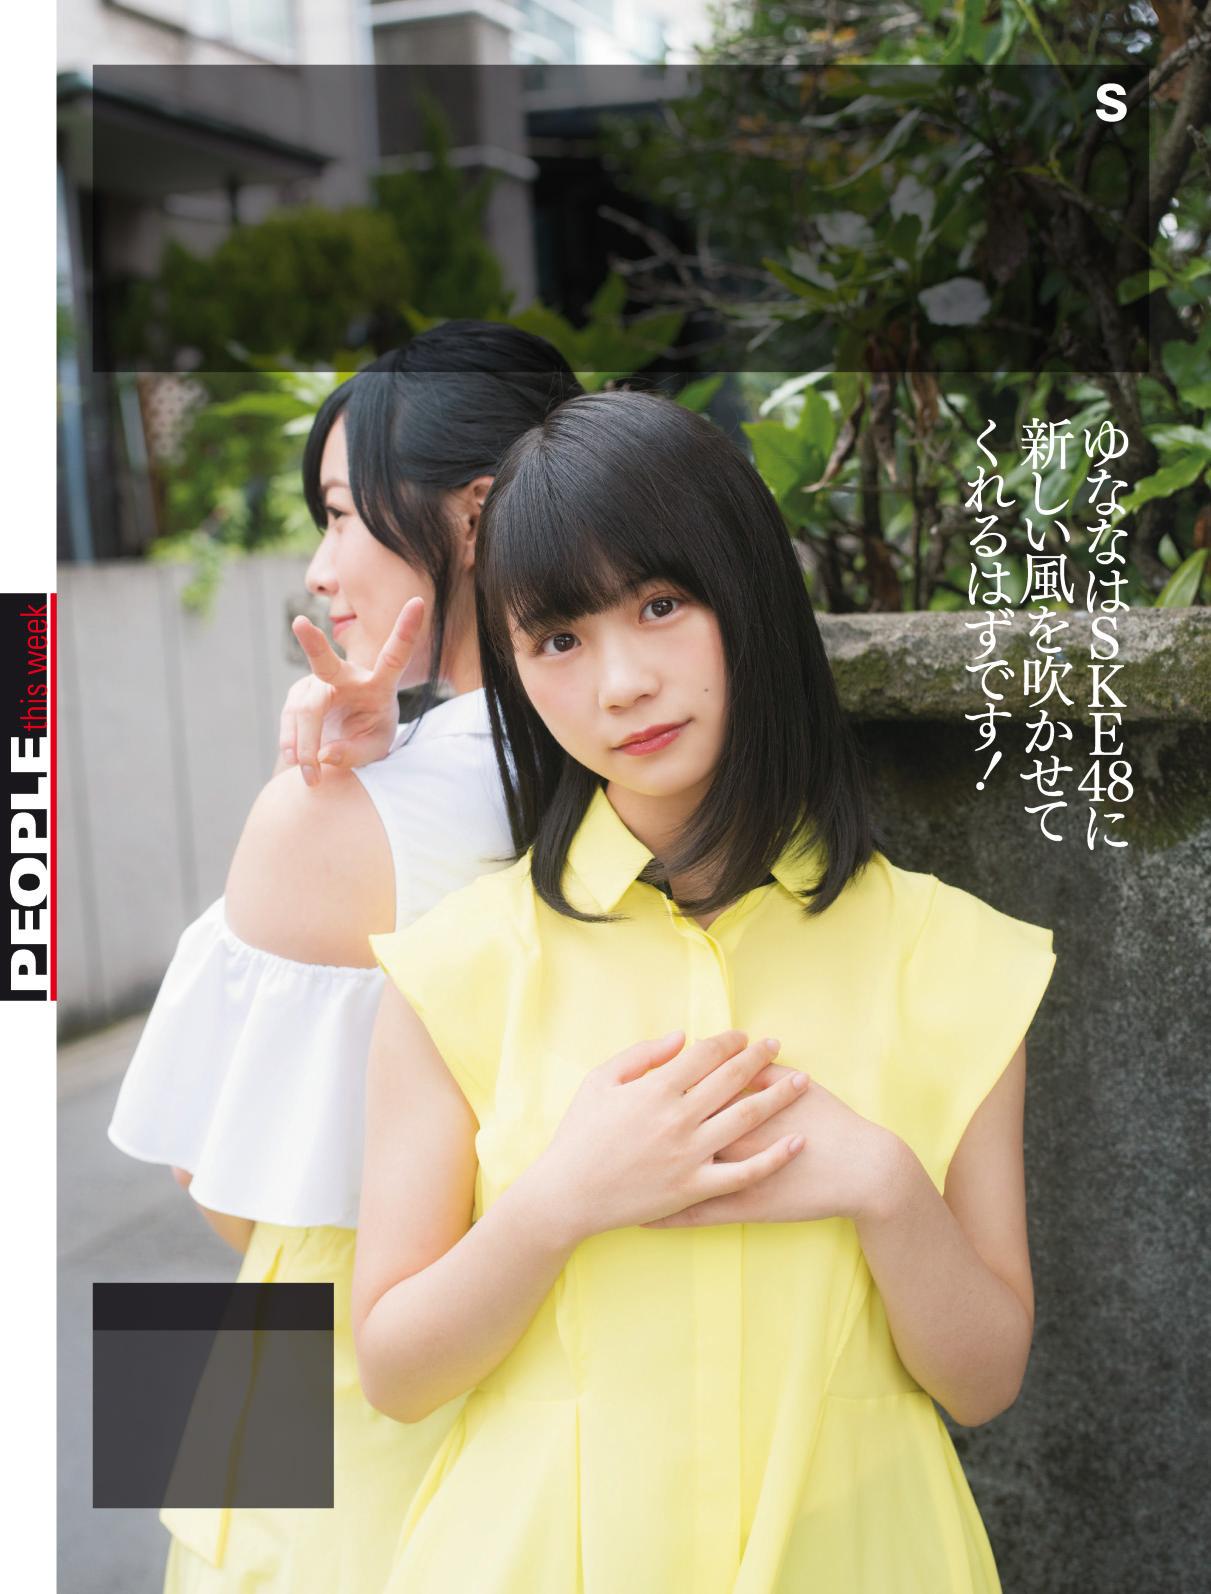 SKE48, Shukan SPA! 2017.07.18 No.3541 (週刊スパ 2017年07月18日号)